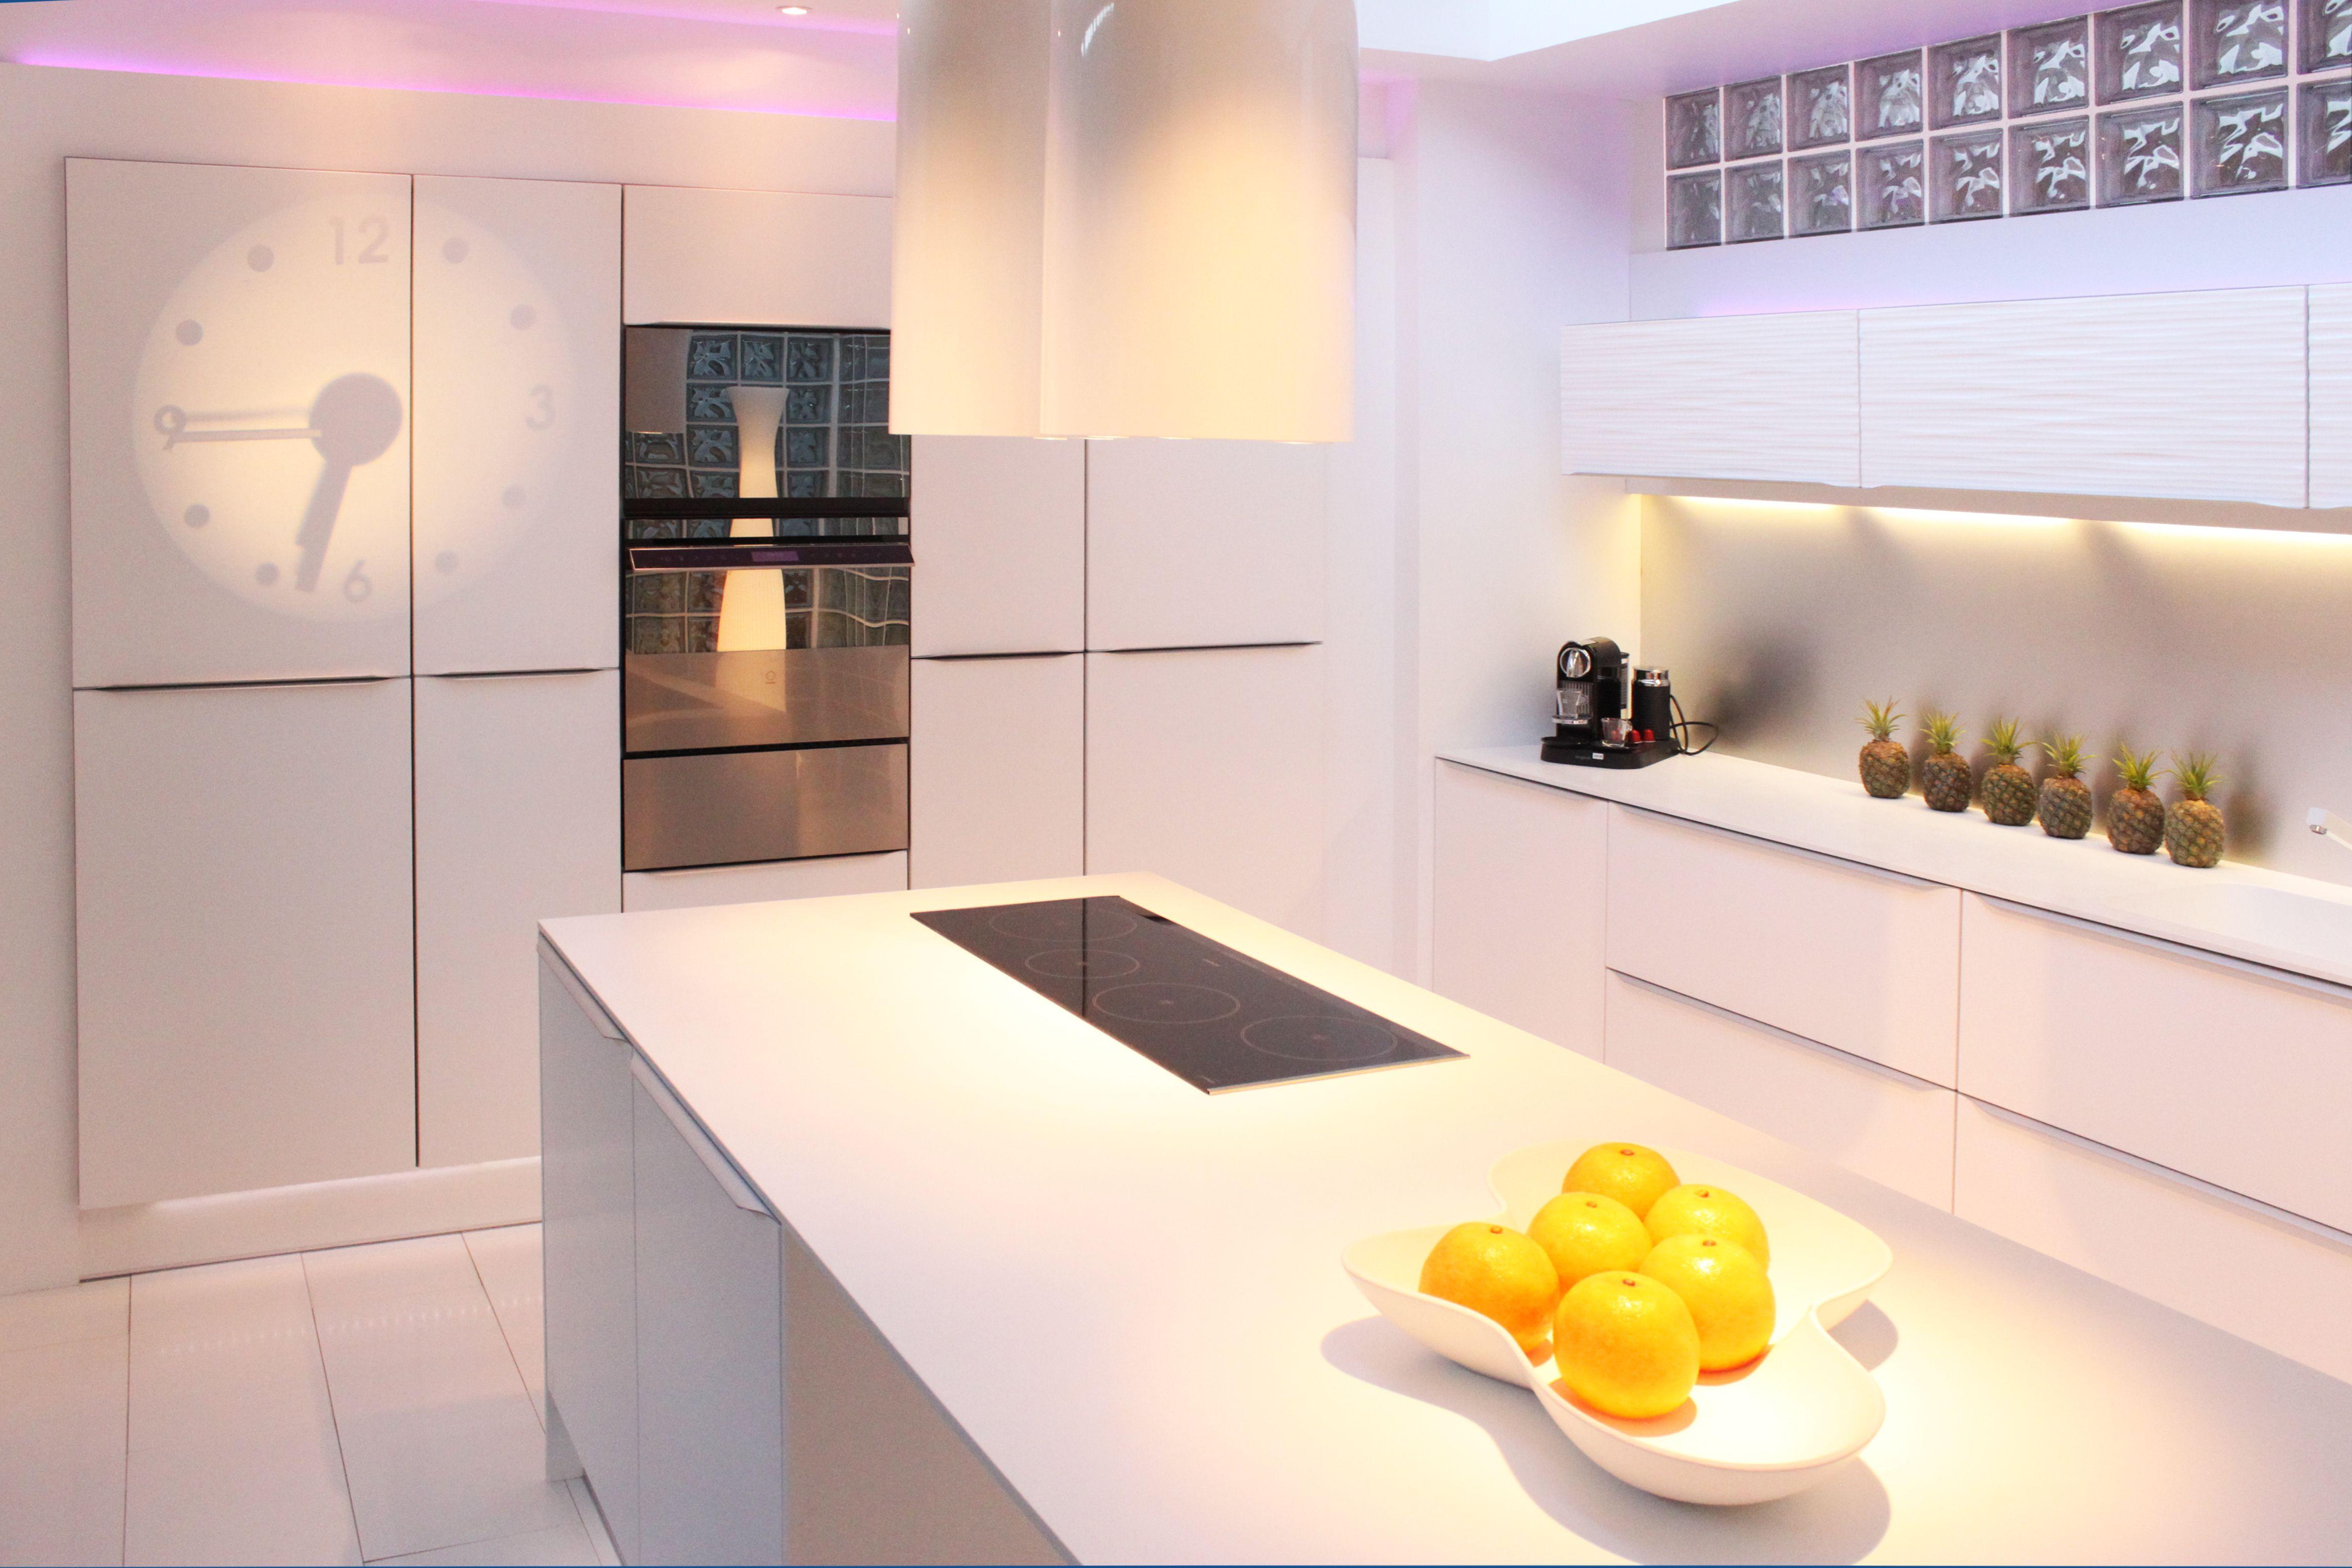 Cuisine fabrimeuble laqu e blanc mat plateau corian cuisine pinterest fabricant cuisine - Cuisine blanc mat ...